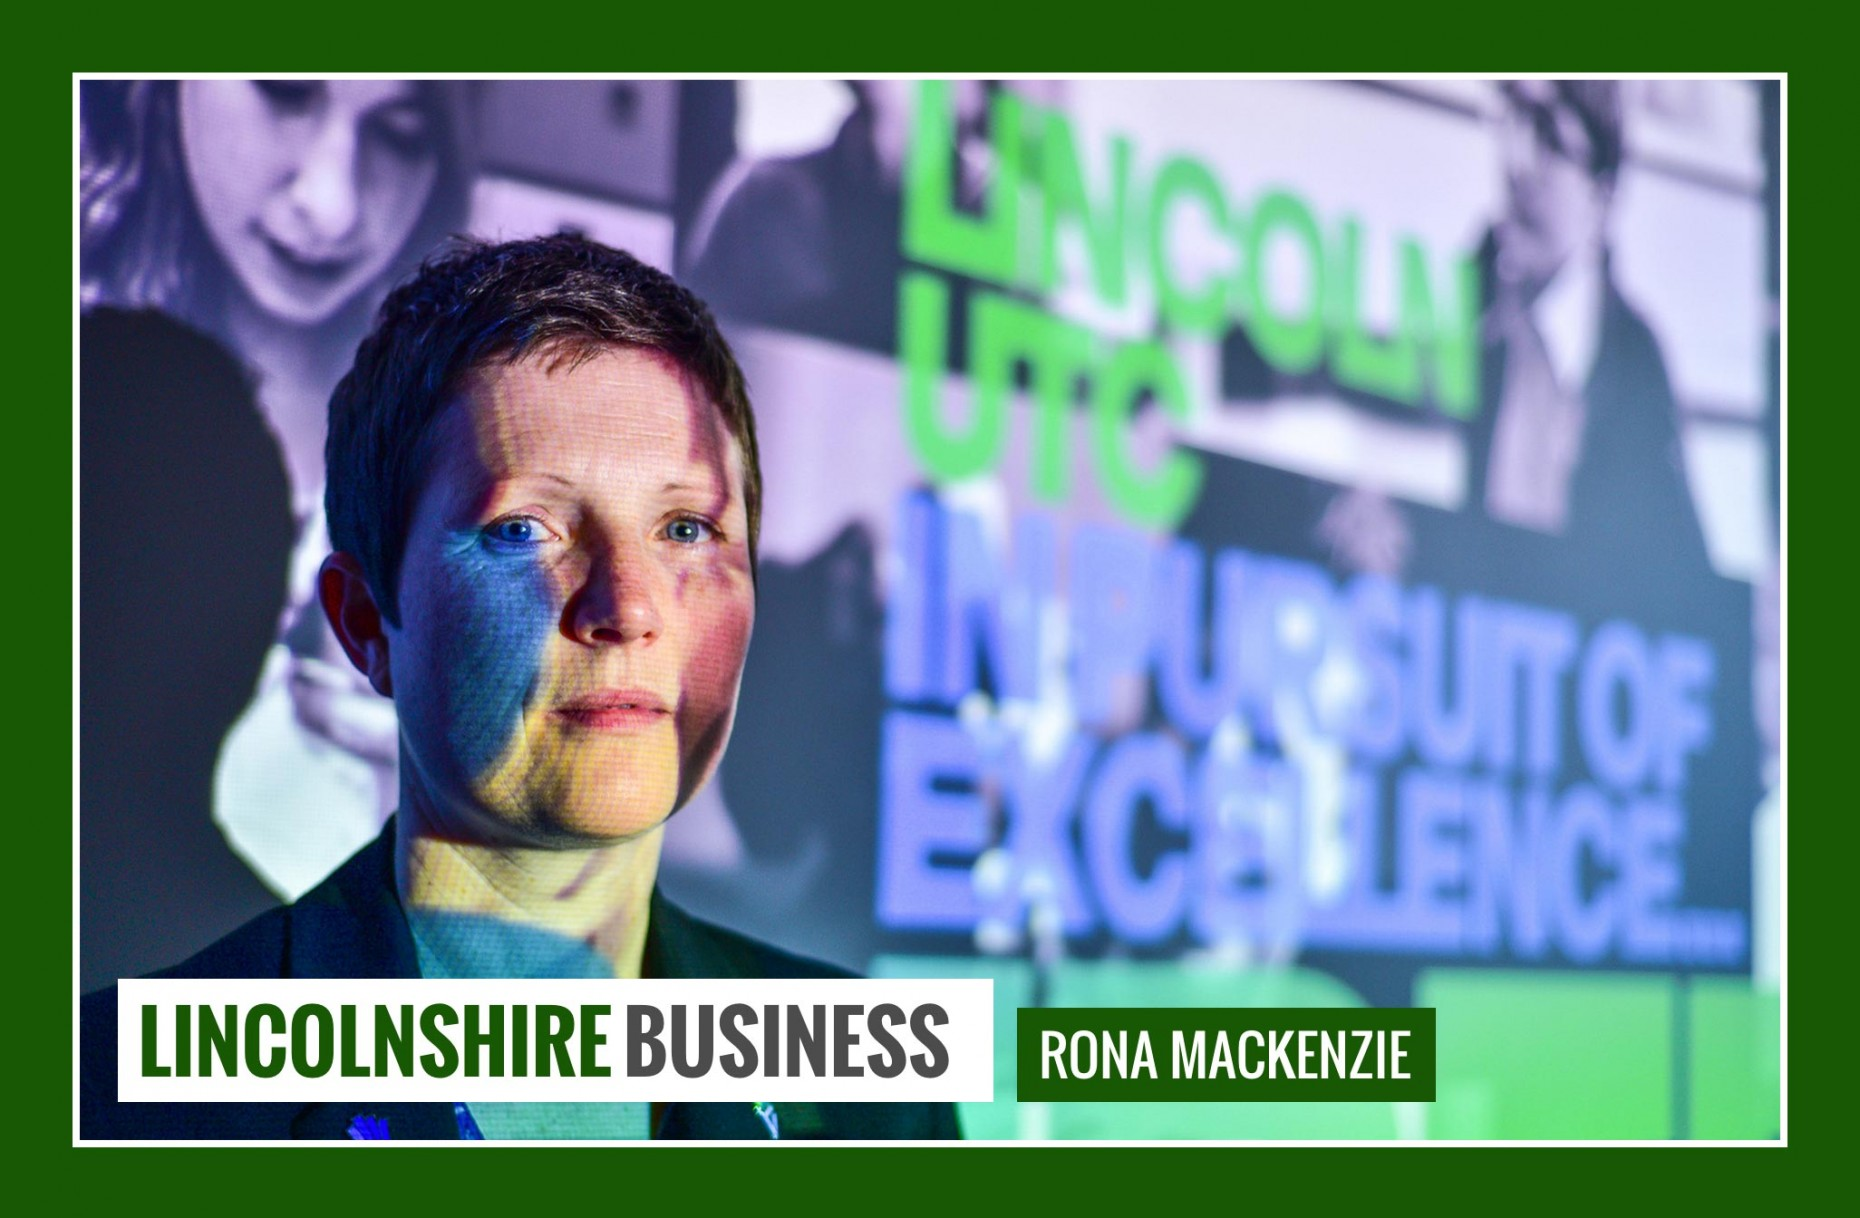 Lincolnshire Business 20 Rona MacKenzie